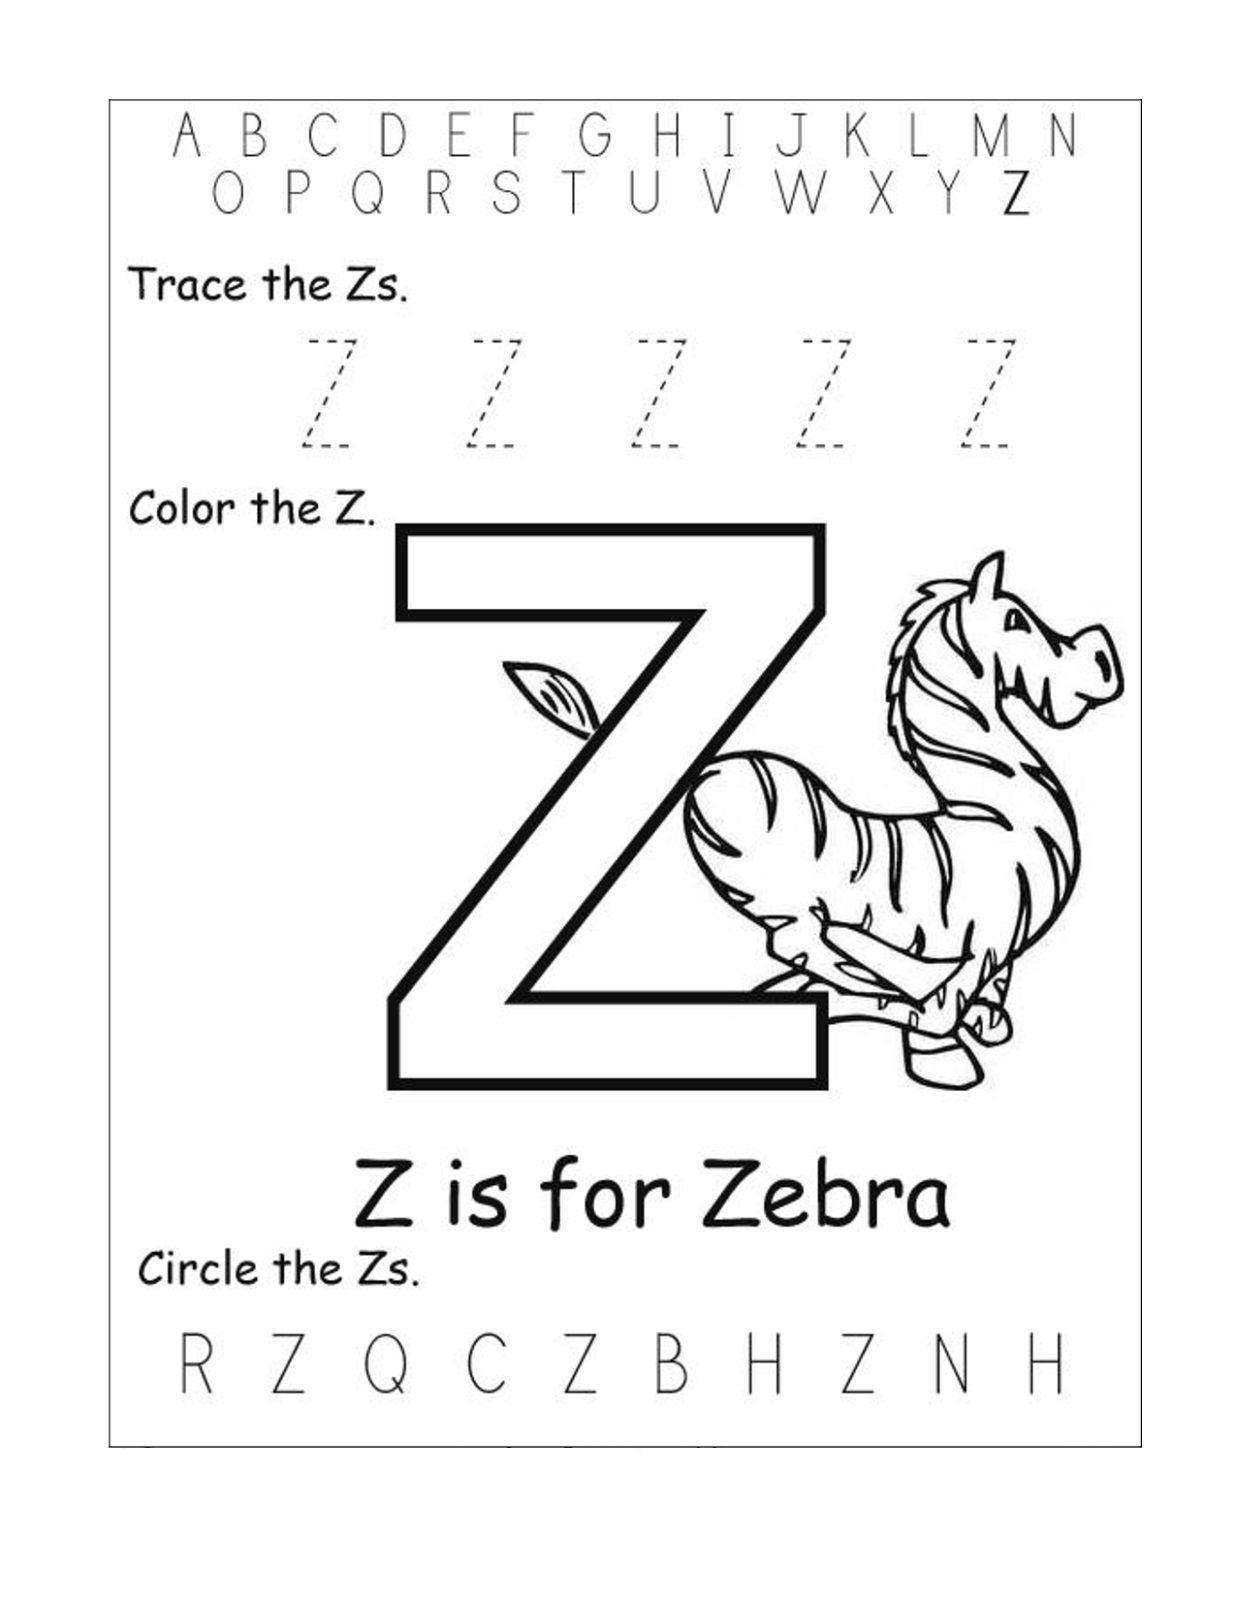 Letter Z Worksheets - Kids Learning Activity | Preschool regarding Letter Z Worksheets For Kindergarten